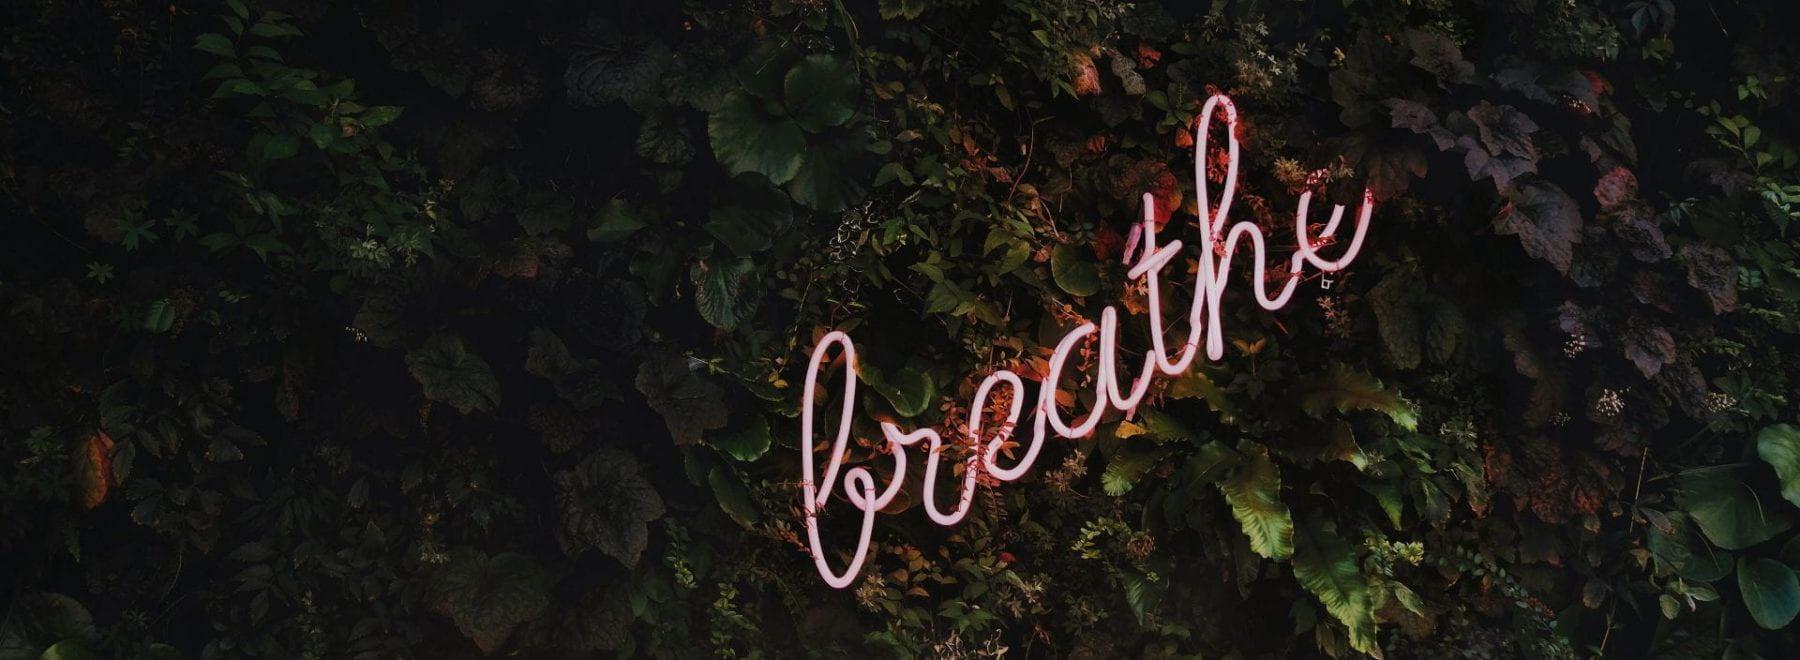 neon sign saying 'breathe'